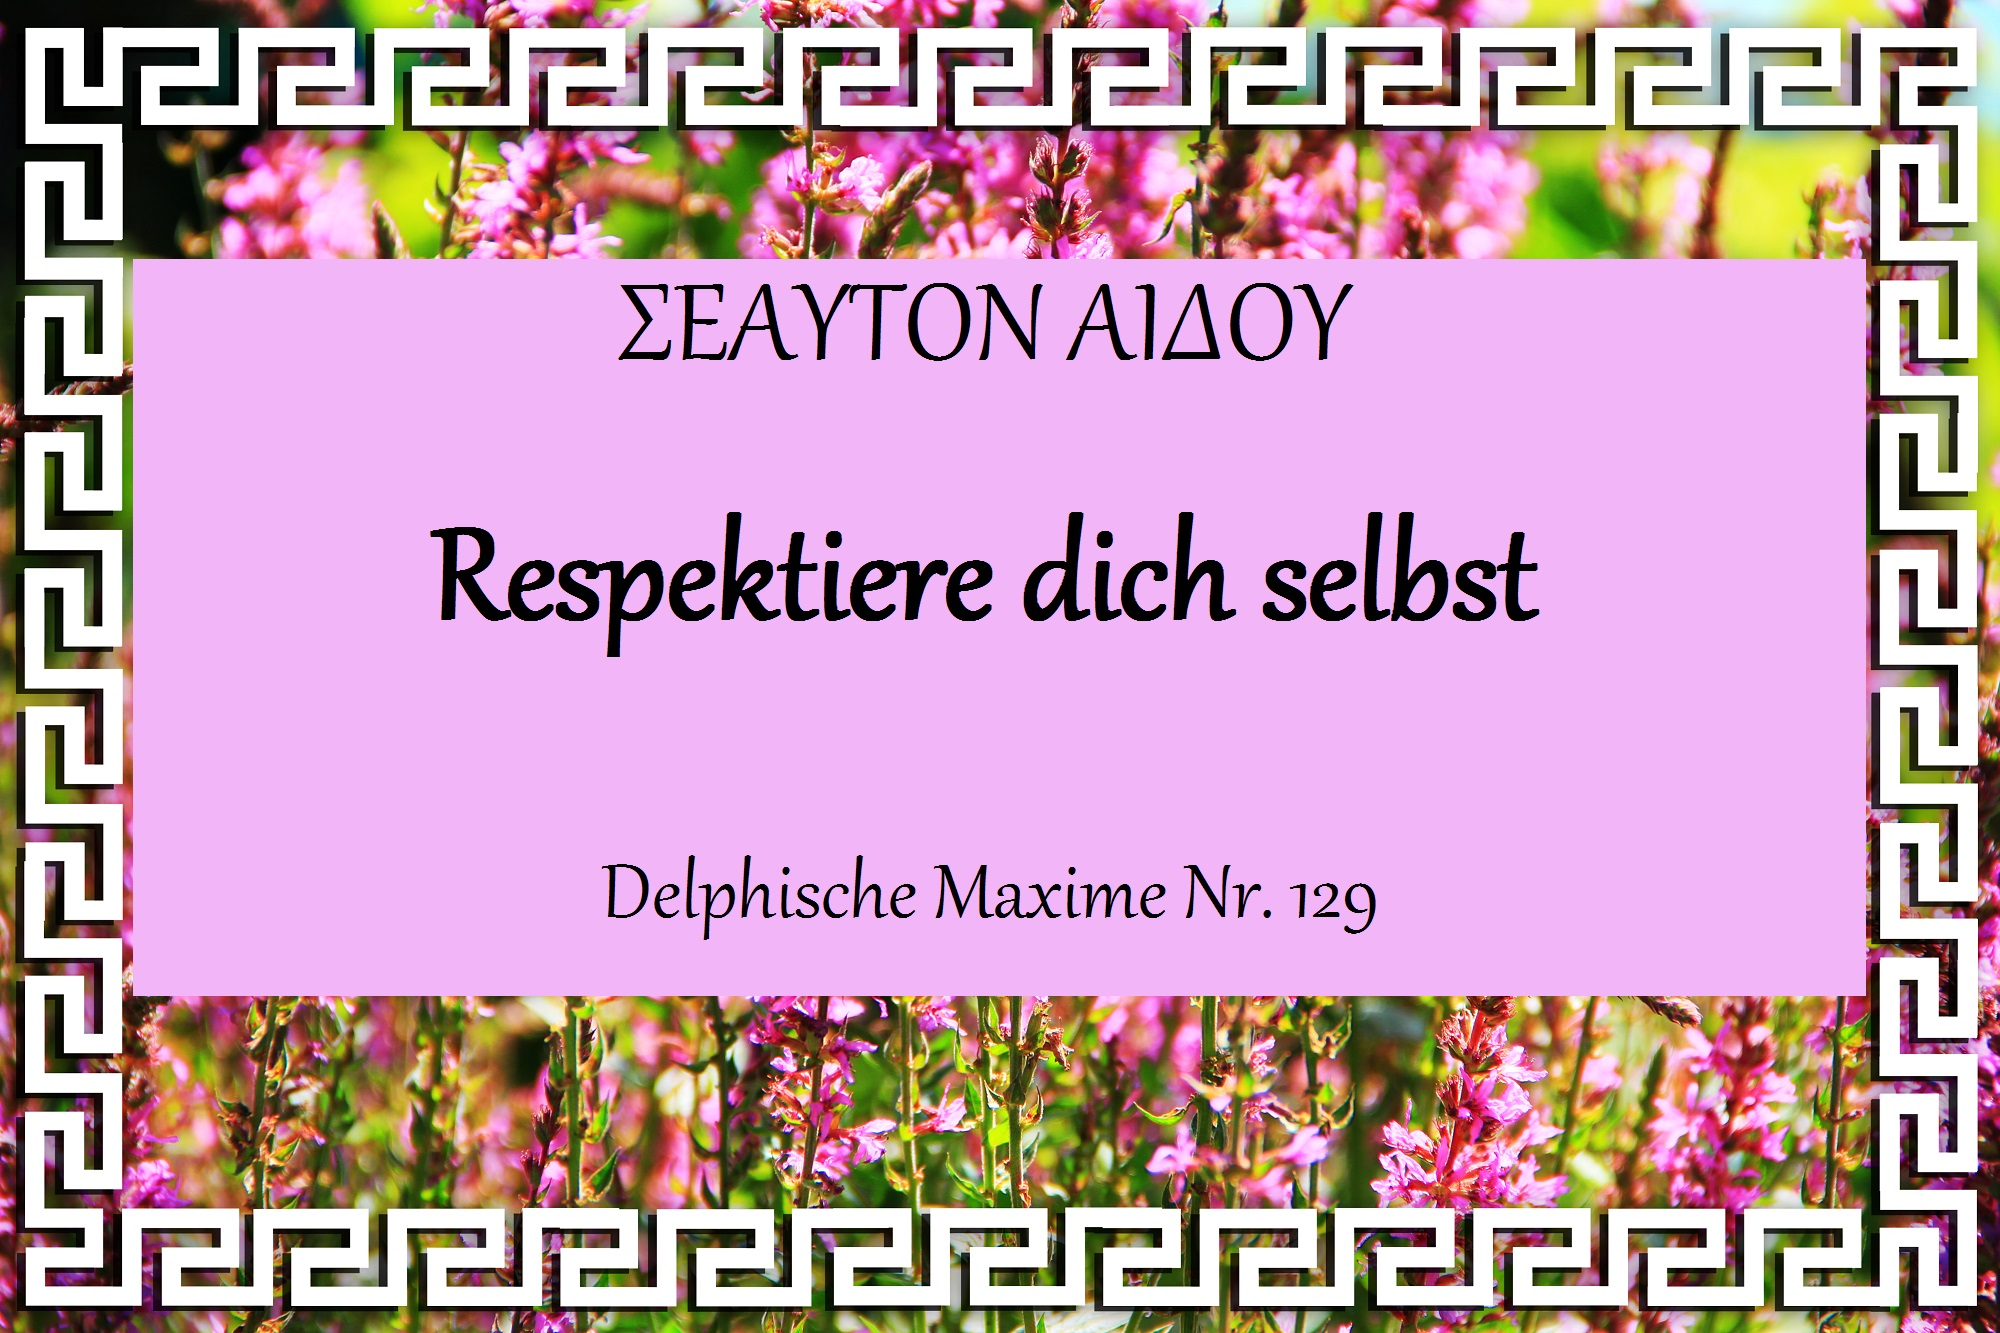 Respektiere dich selbst